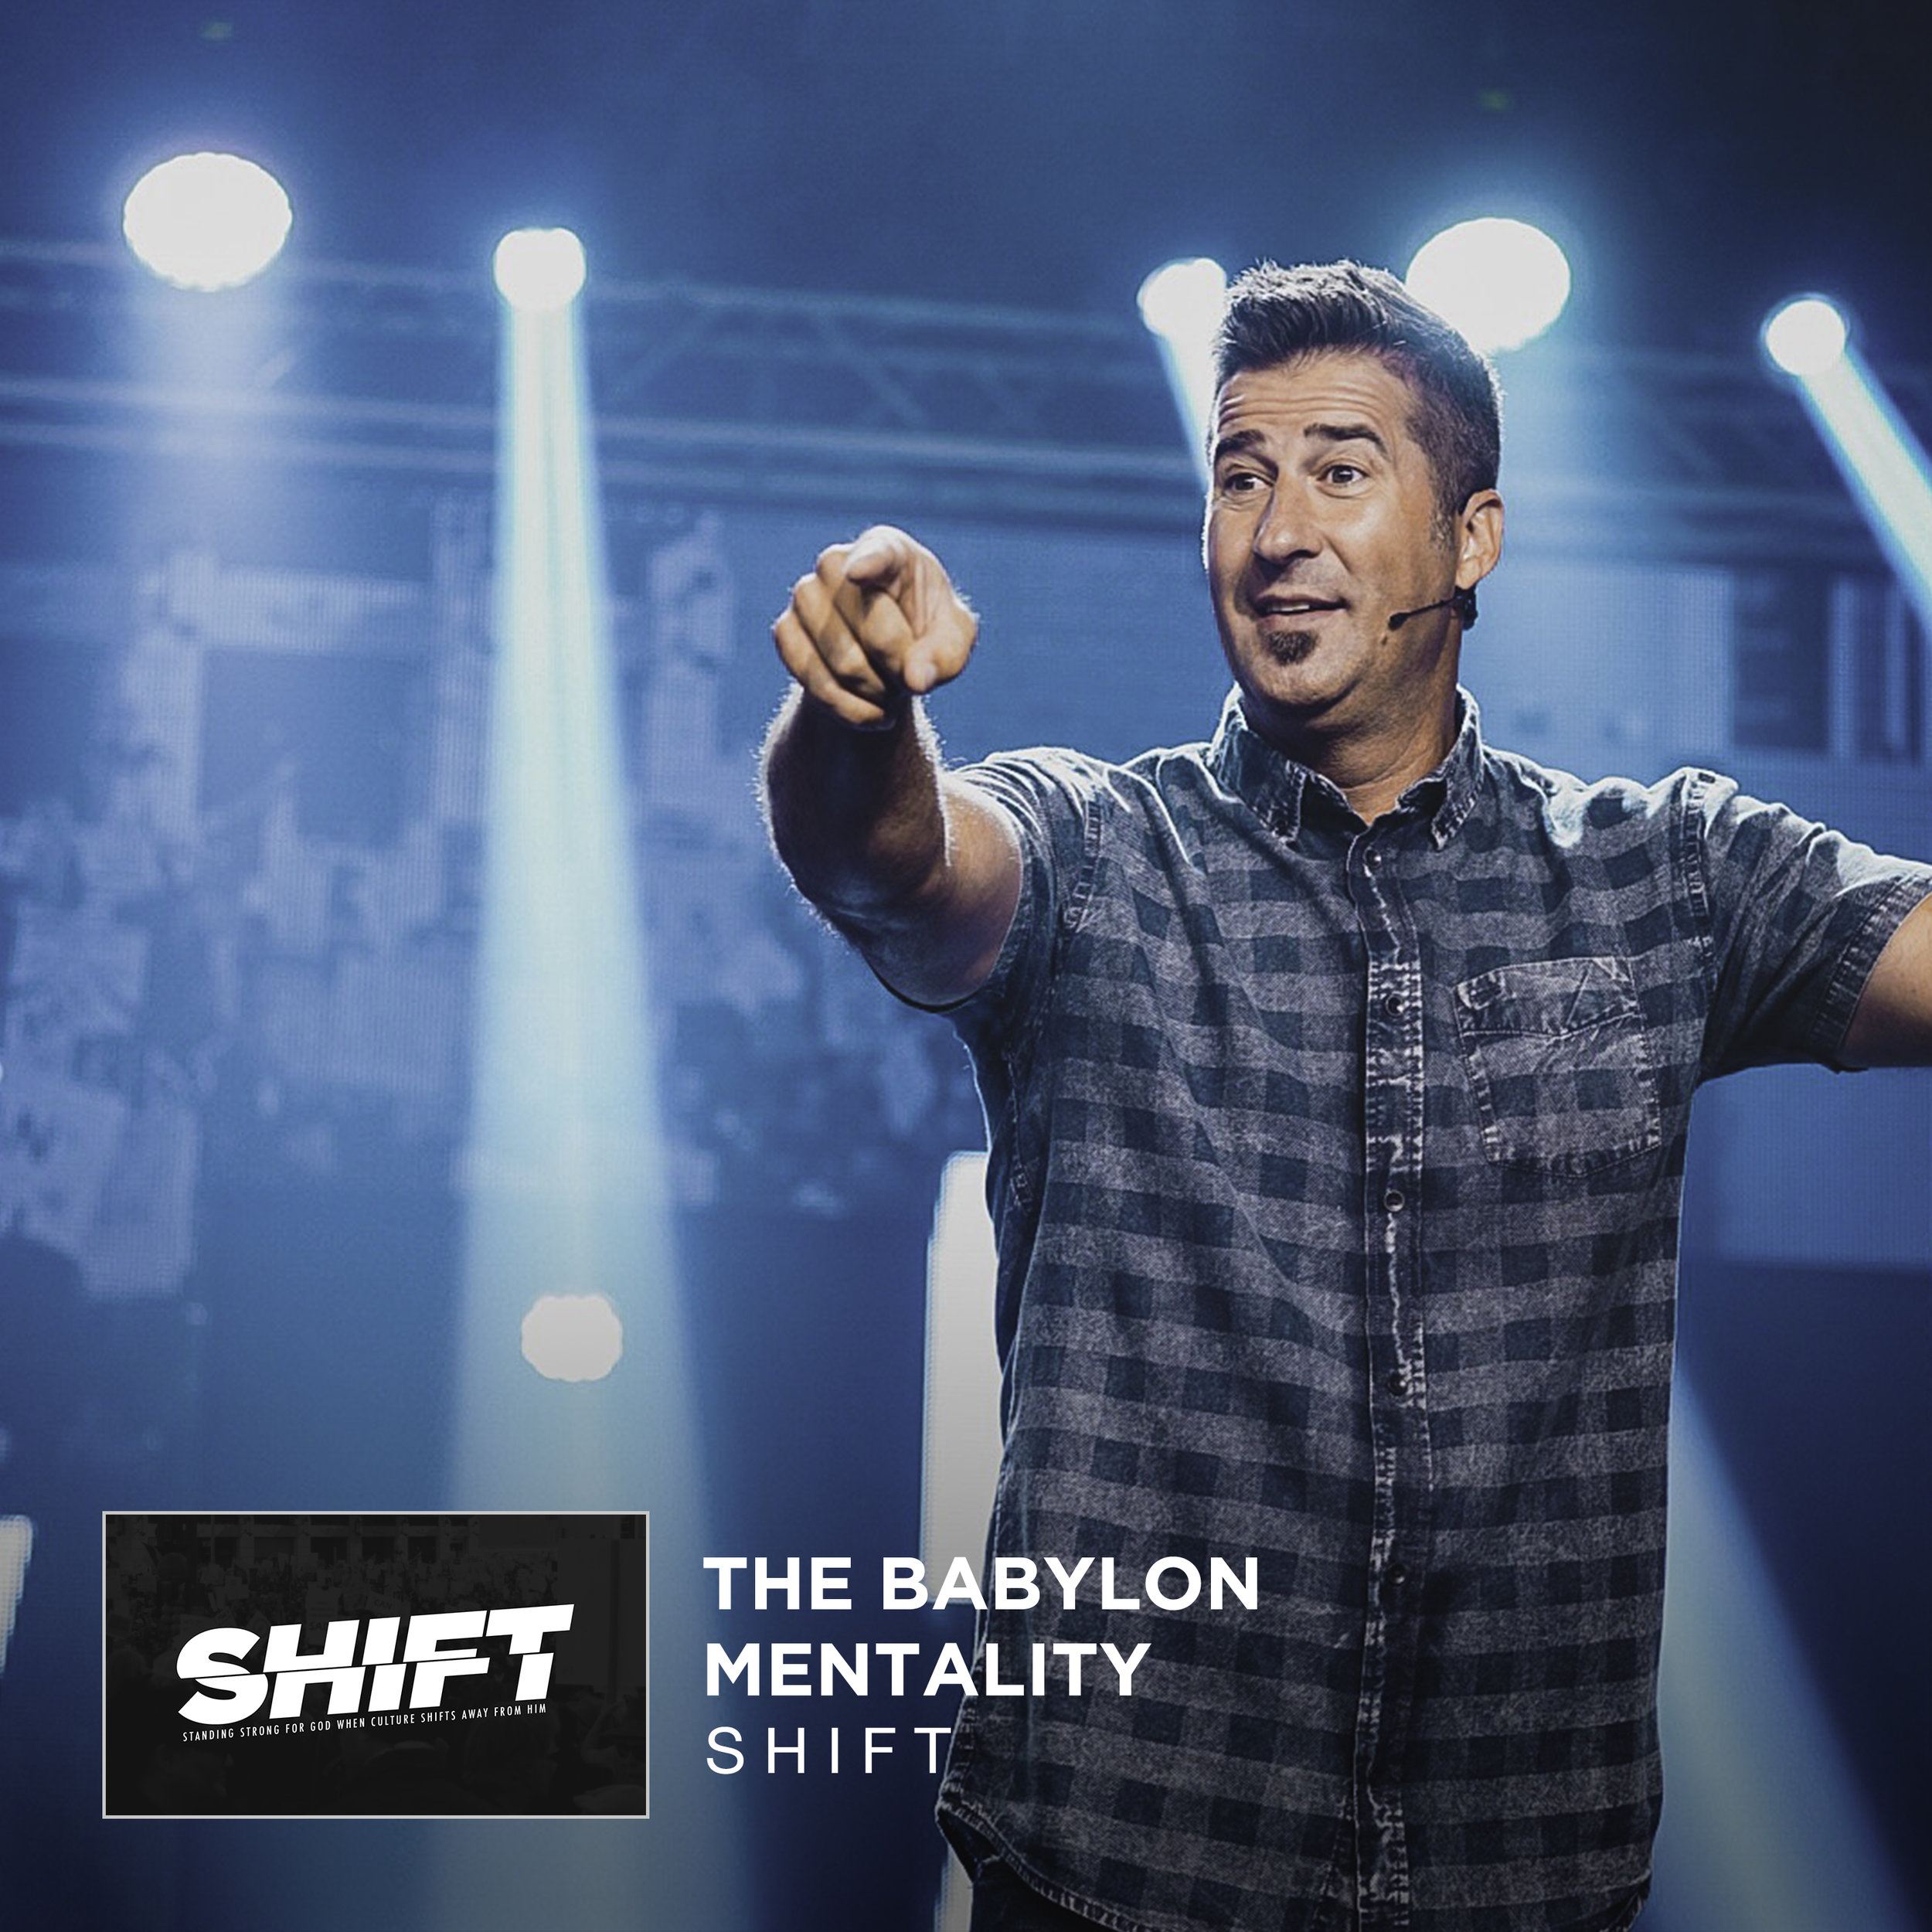 Shift - The Babylon Mentality - Jared Ming Web.jpg